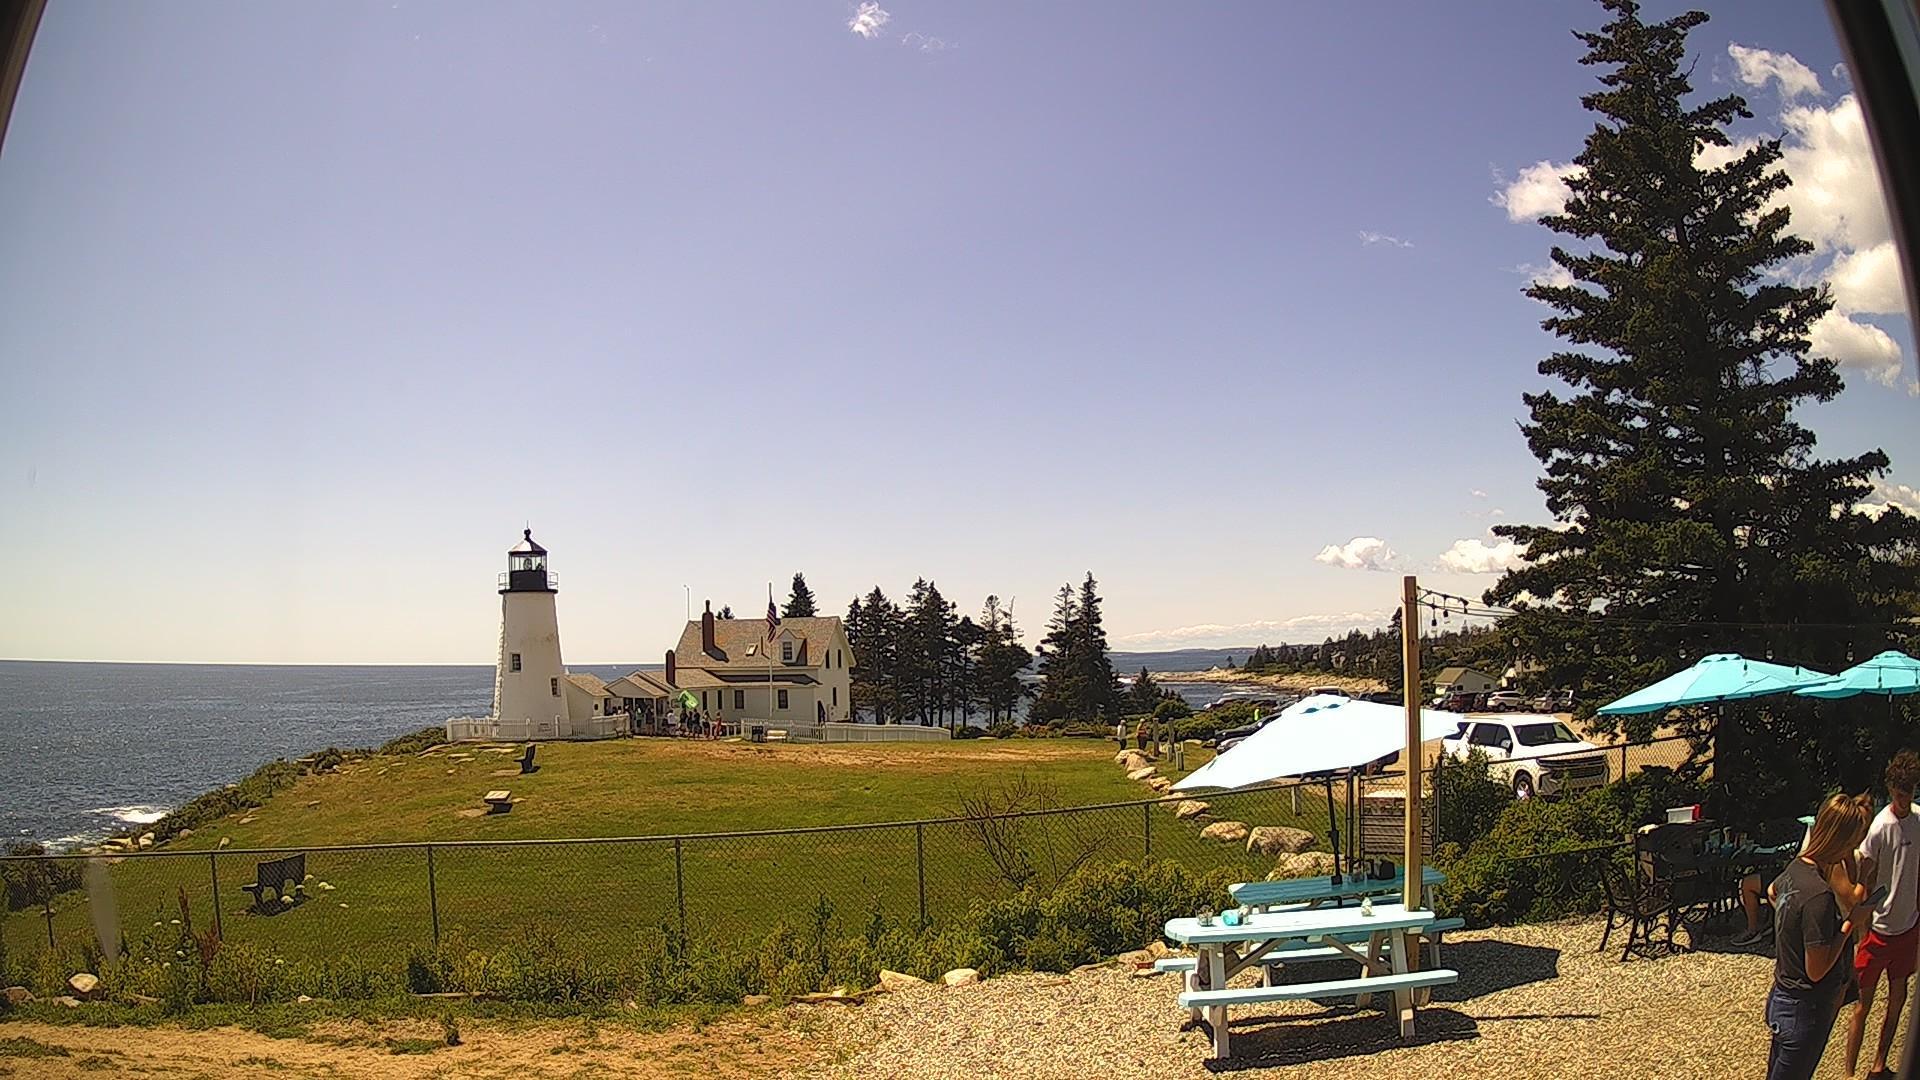 Webcam Pemaquid Point: Pemaquid Lighthouse